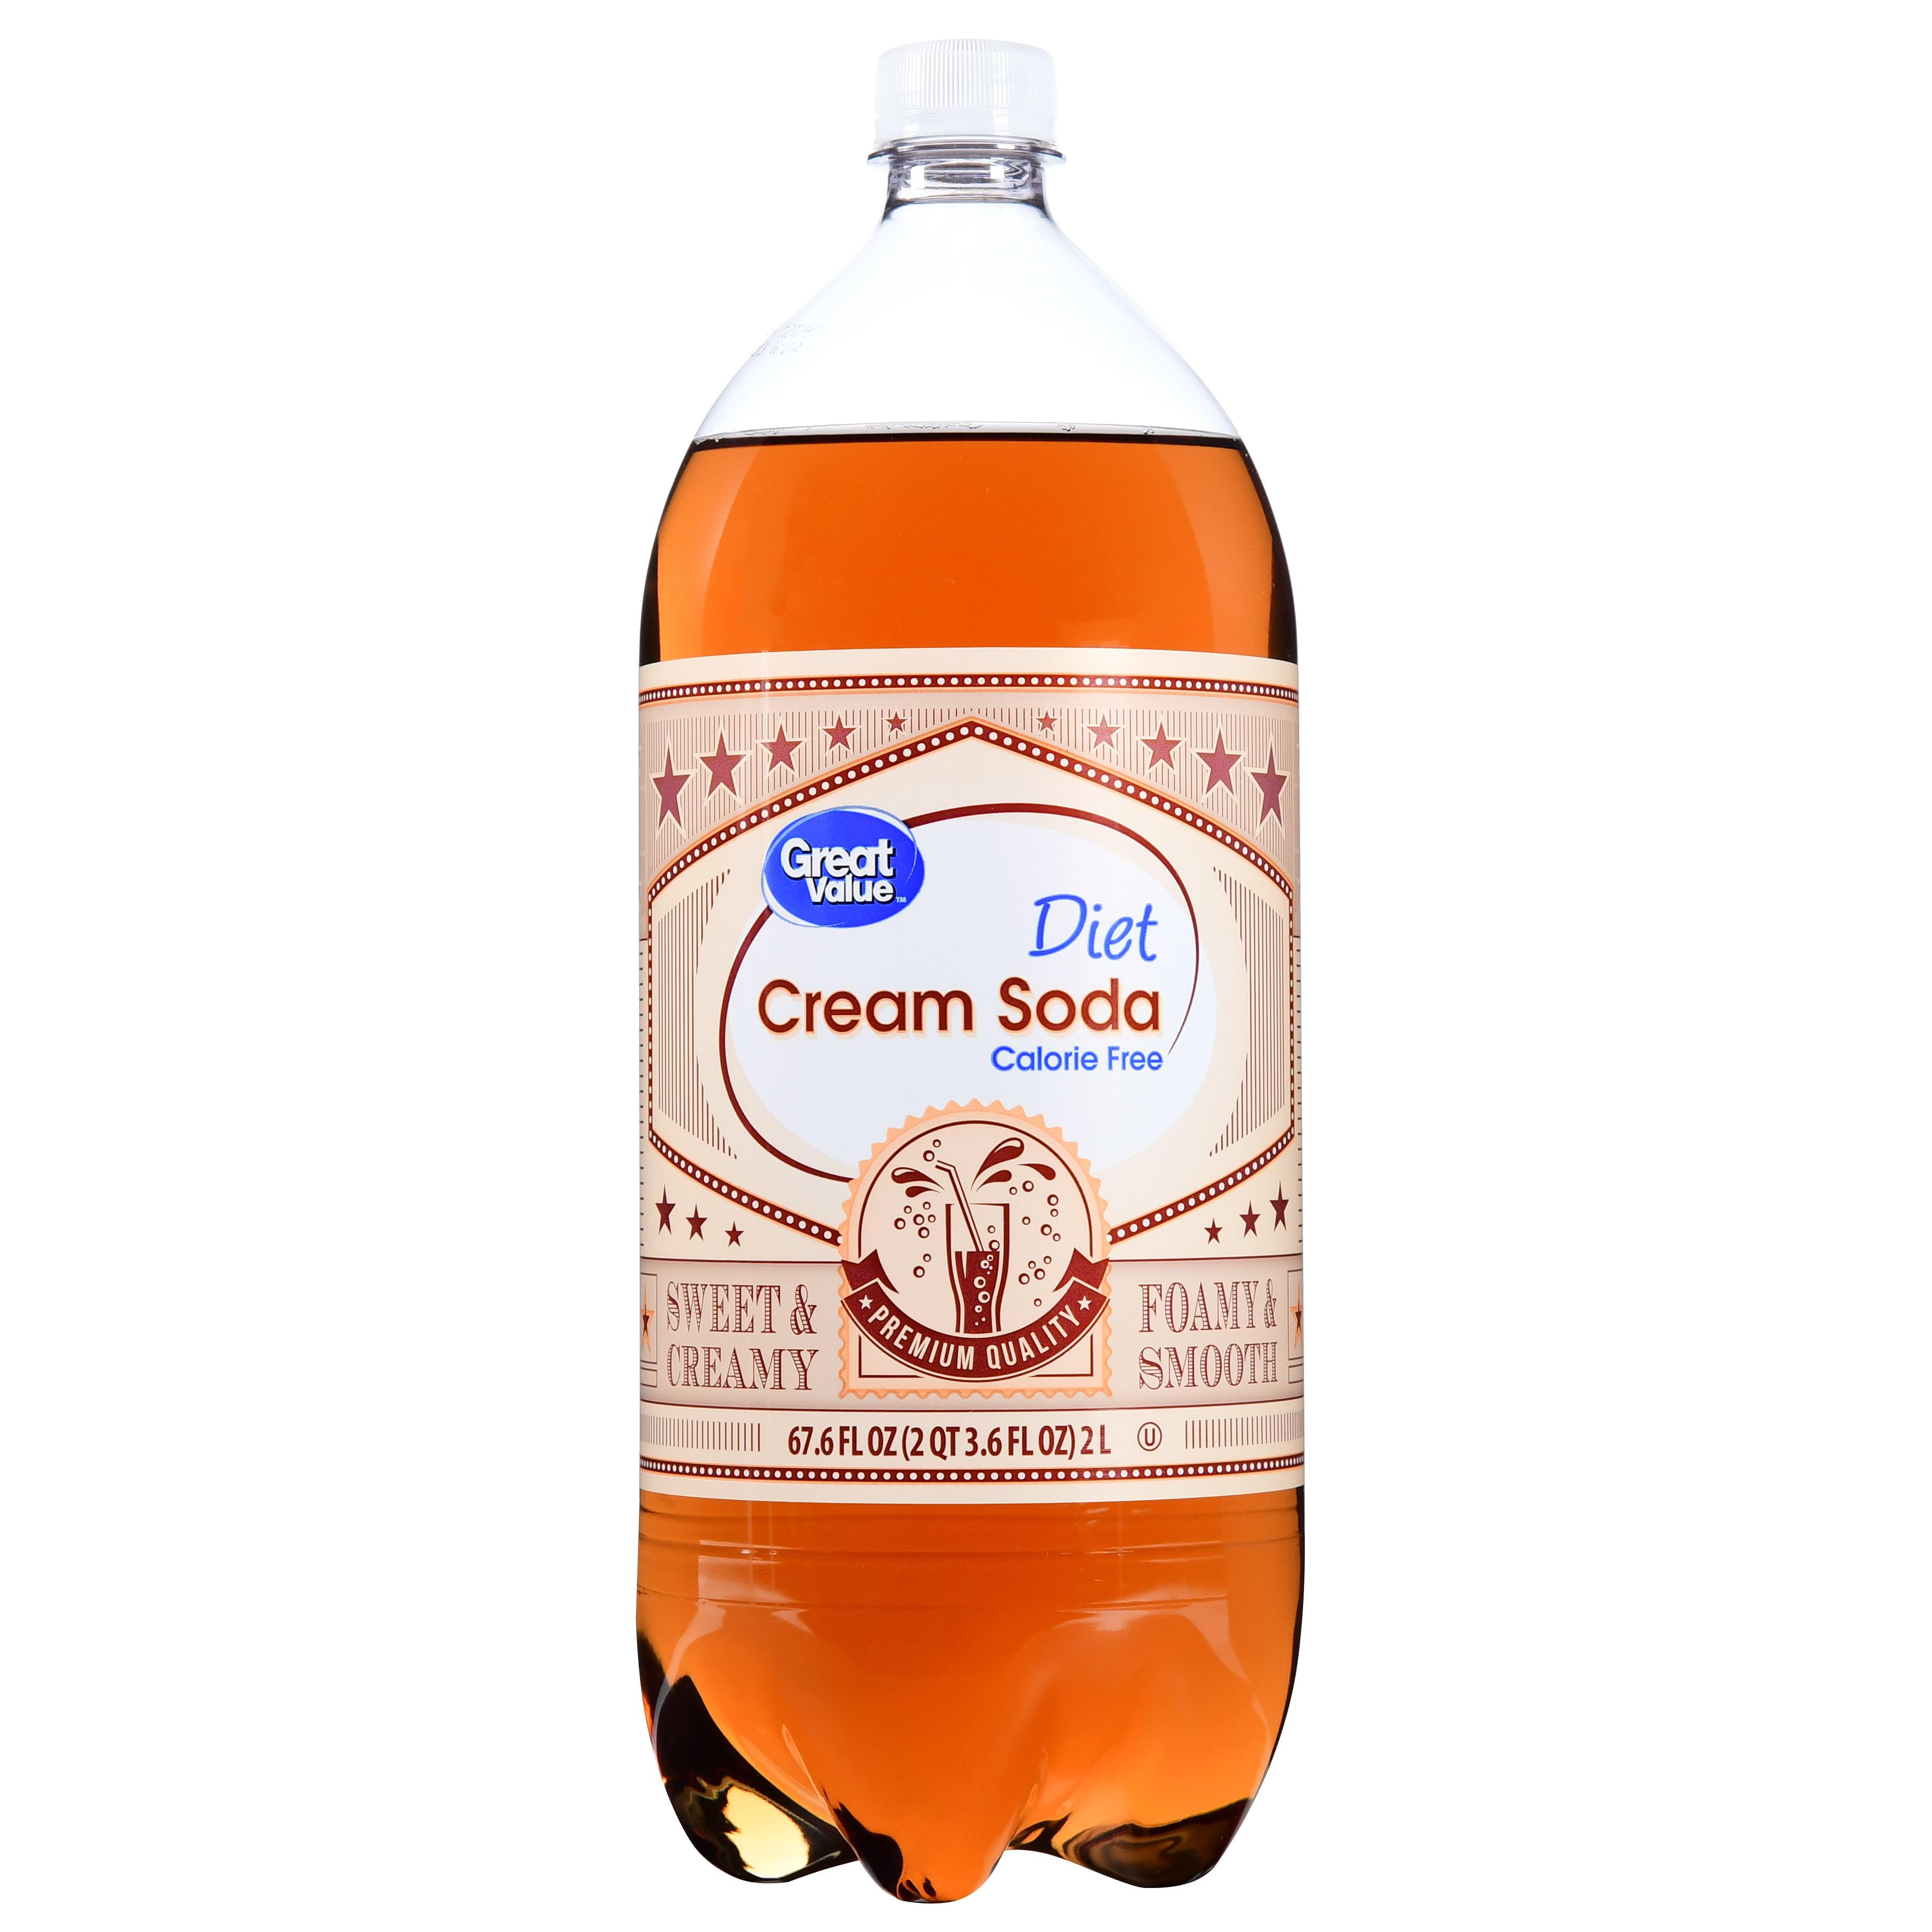 Great Value Diet Cream Soda, 2 L, 1 Count - Walmart.com